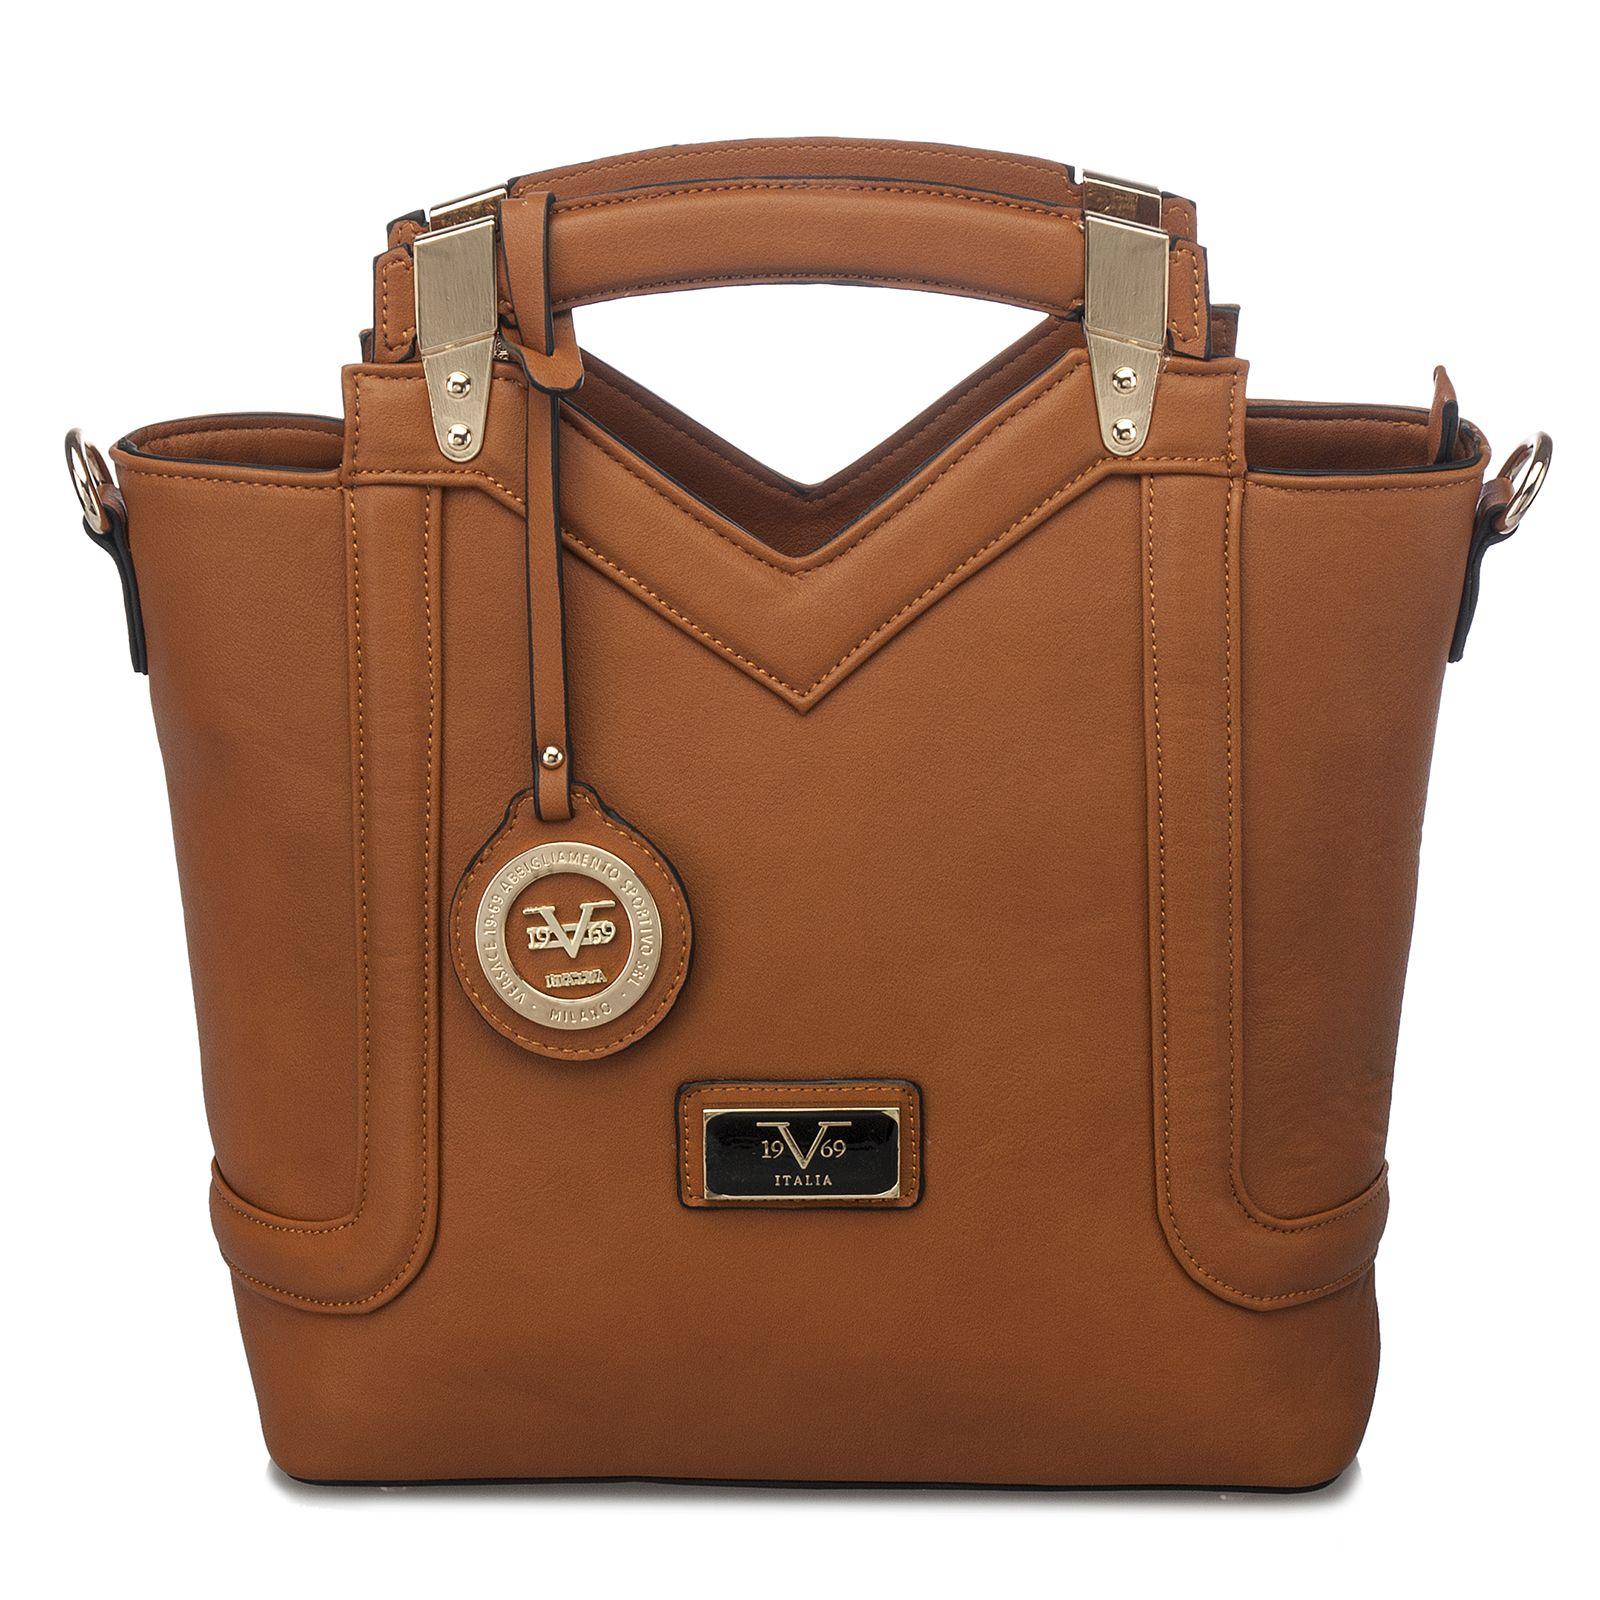 Versace 19 69 Abliamento Sportivo Structured Tote Brown Bnyhandbags